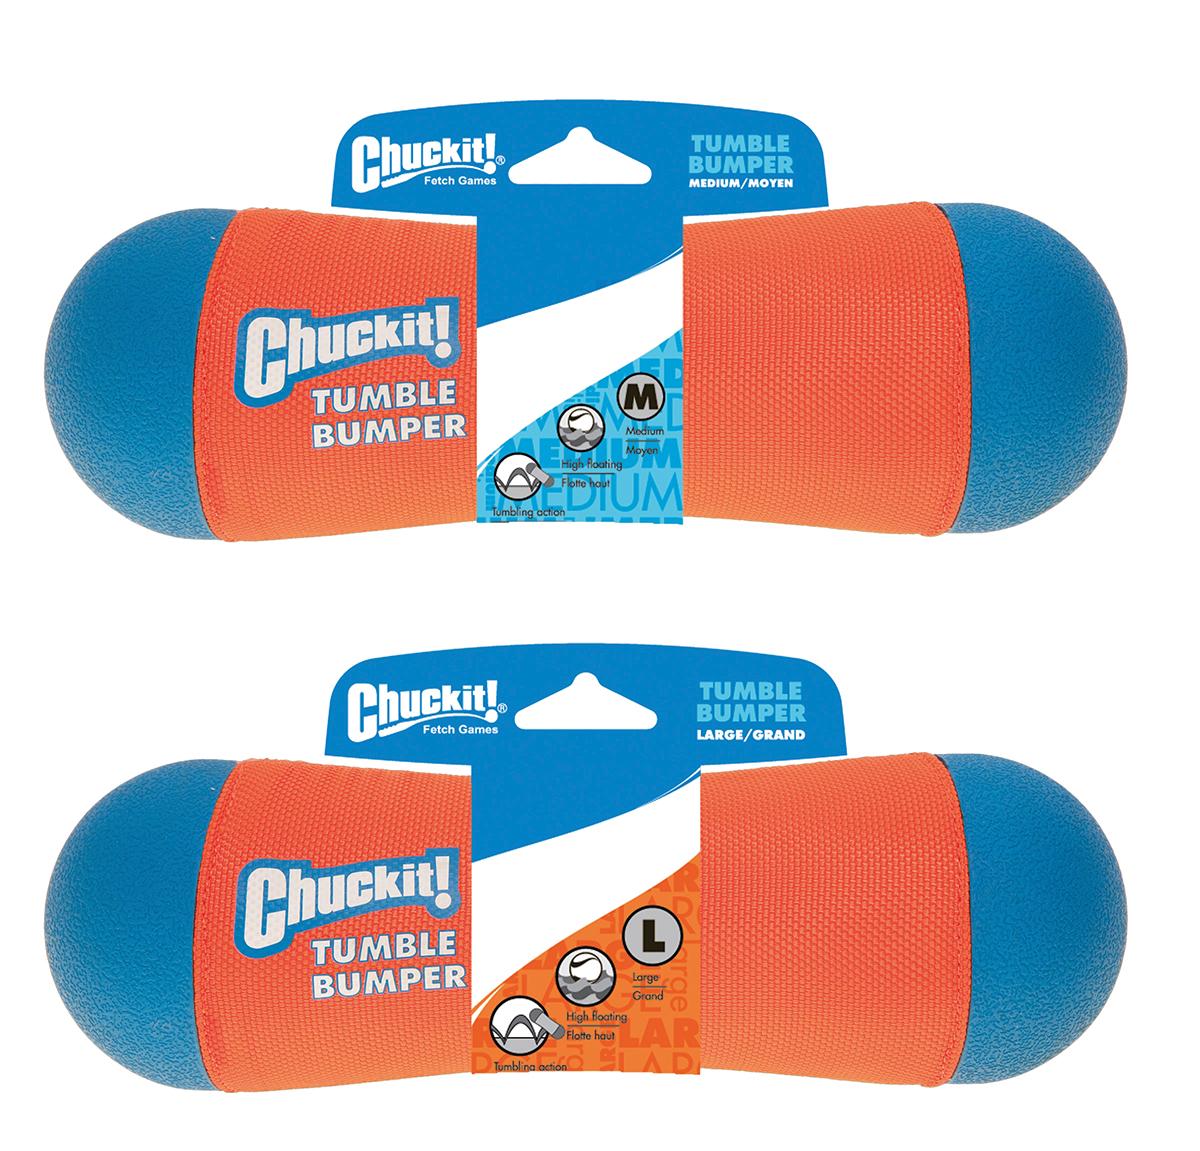 Tumble bumper oranje/blauw